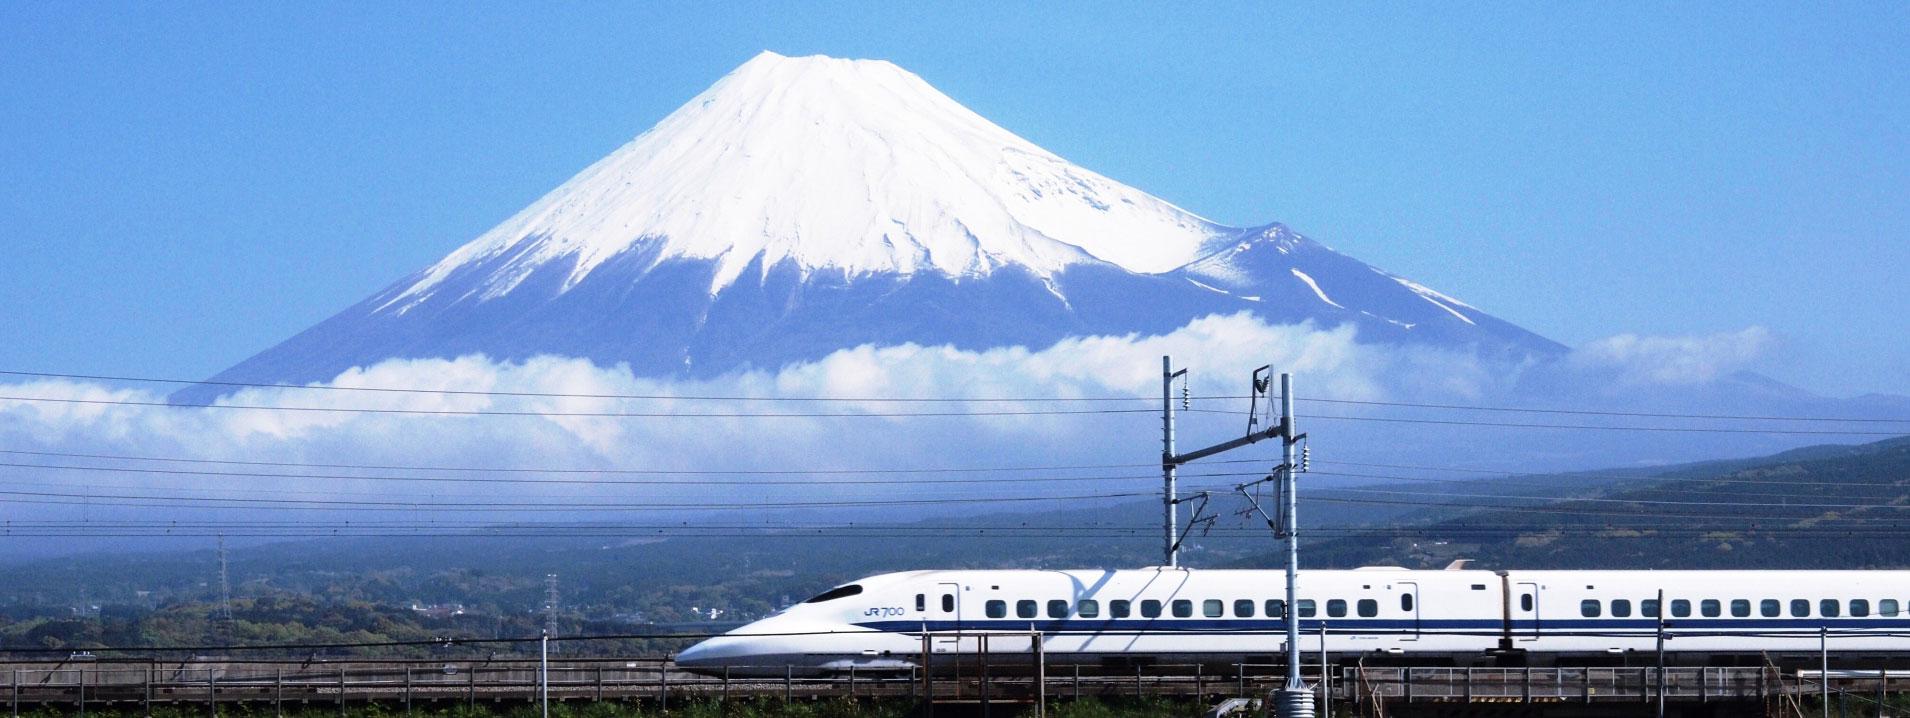 GO TO TOKYO OLYMPIC 2020/2020年東京オリンピック